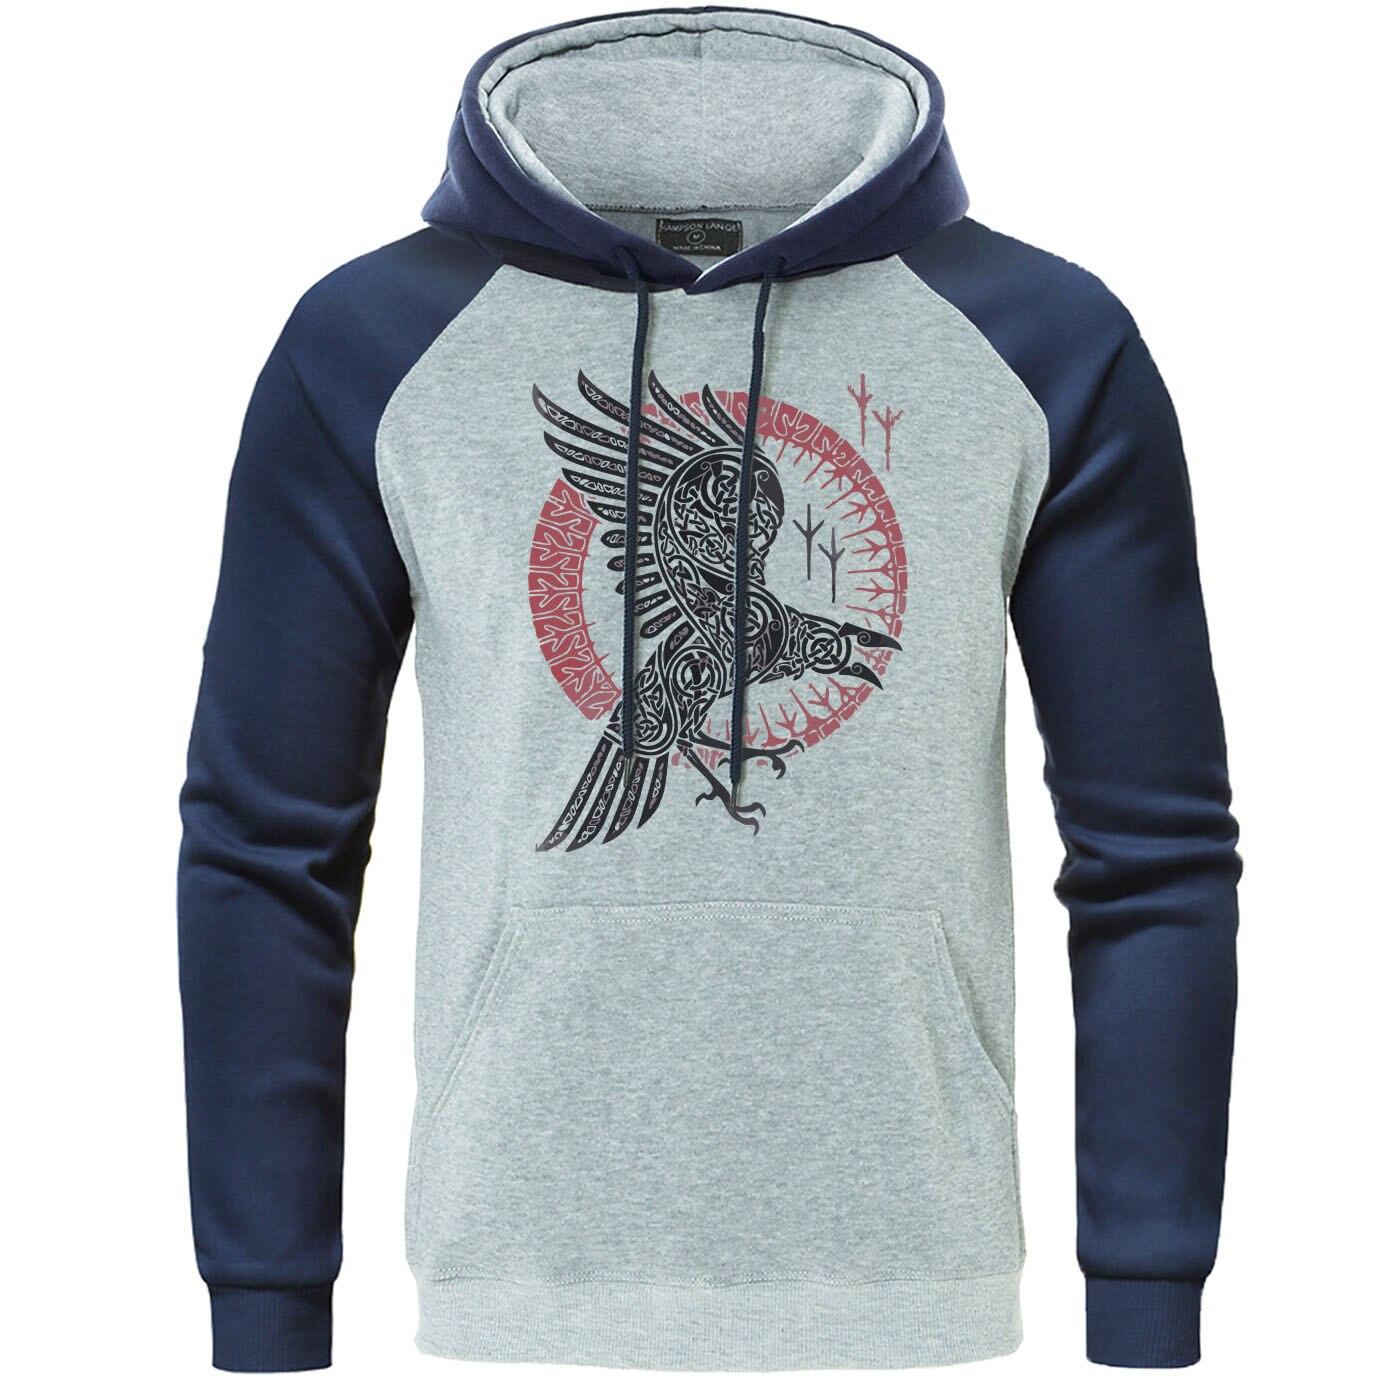 Viking Legend Ragnar's Raven Mens Raglan Hooded Sweatshirt 2019 Autumn Casual Hoodie Fleece Warm Men Pullover Hip Hop Streetwear